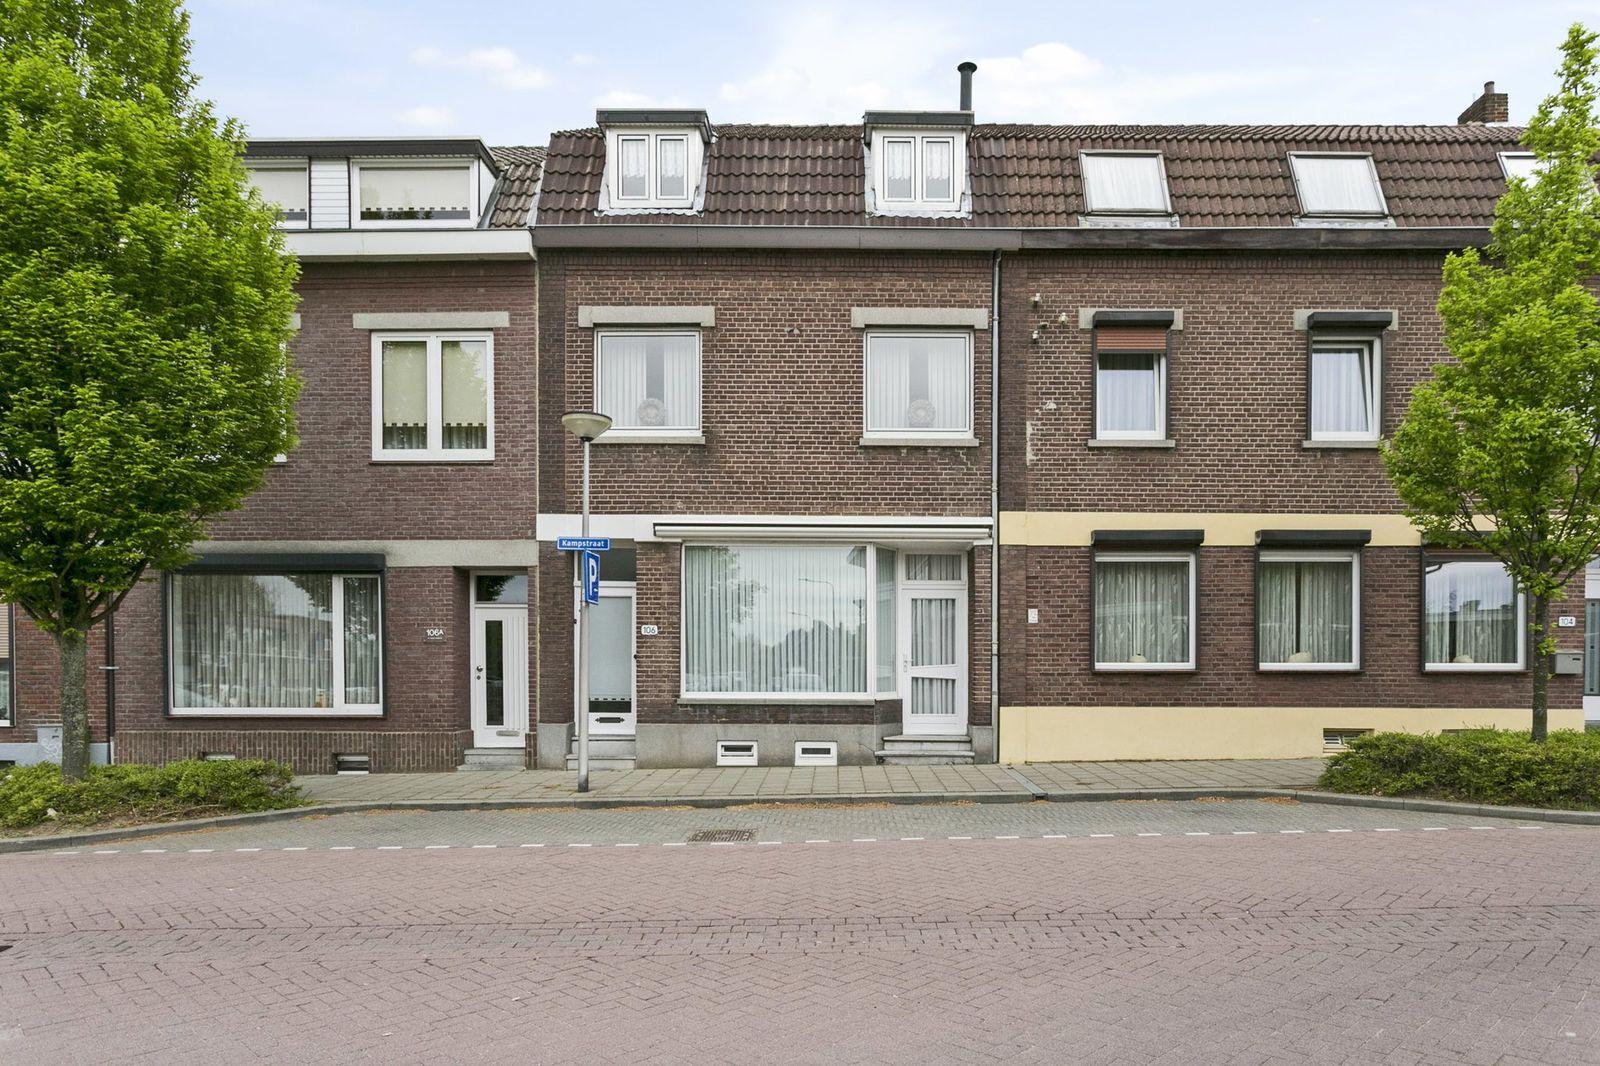 Kampstraat 106, Kerkrade